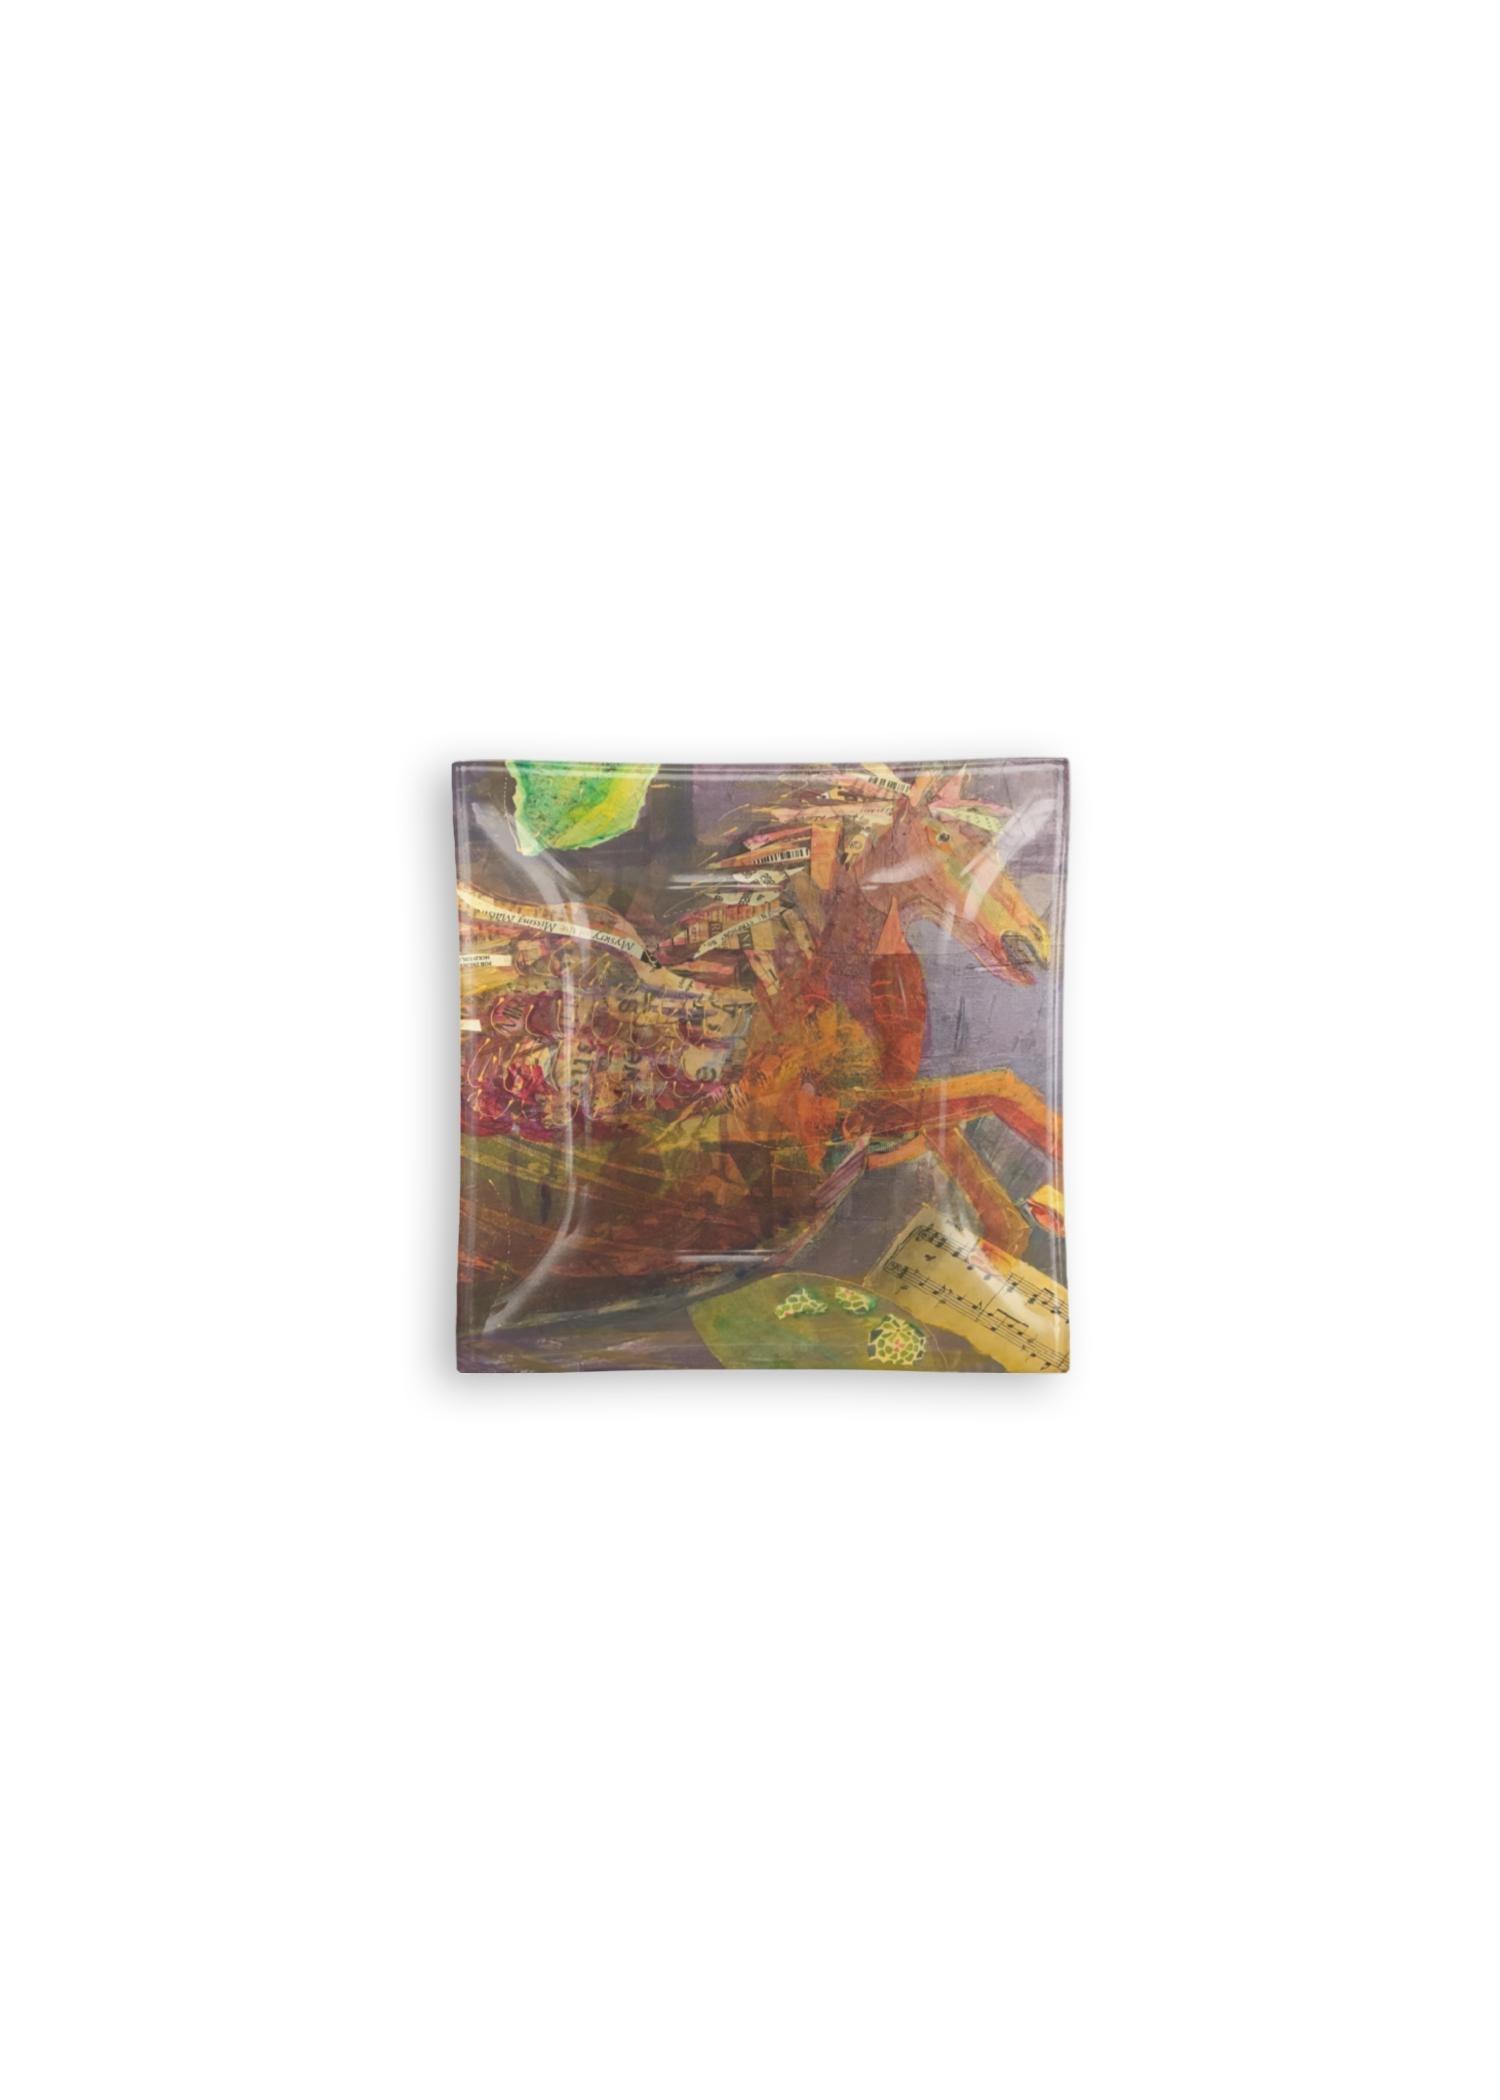 VIDA Square Glass Tray - Music In Flight by VIDA Original Artist  - Size: Large